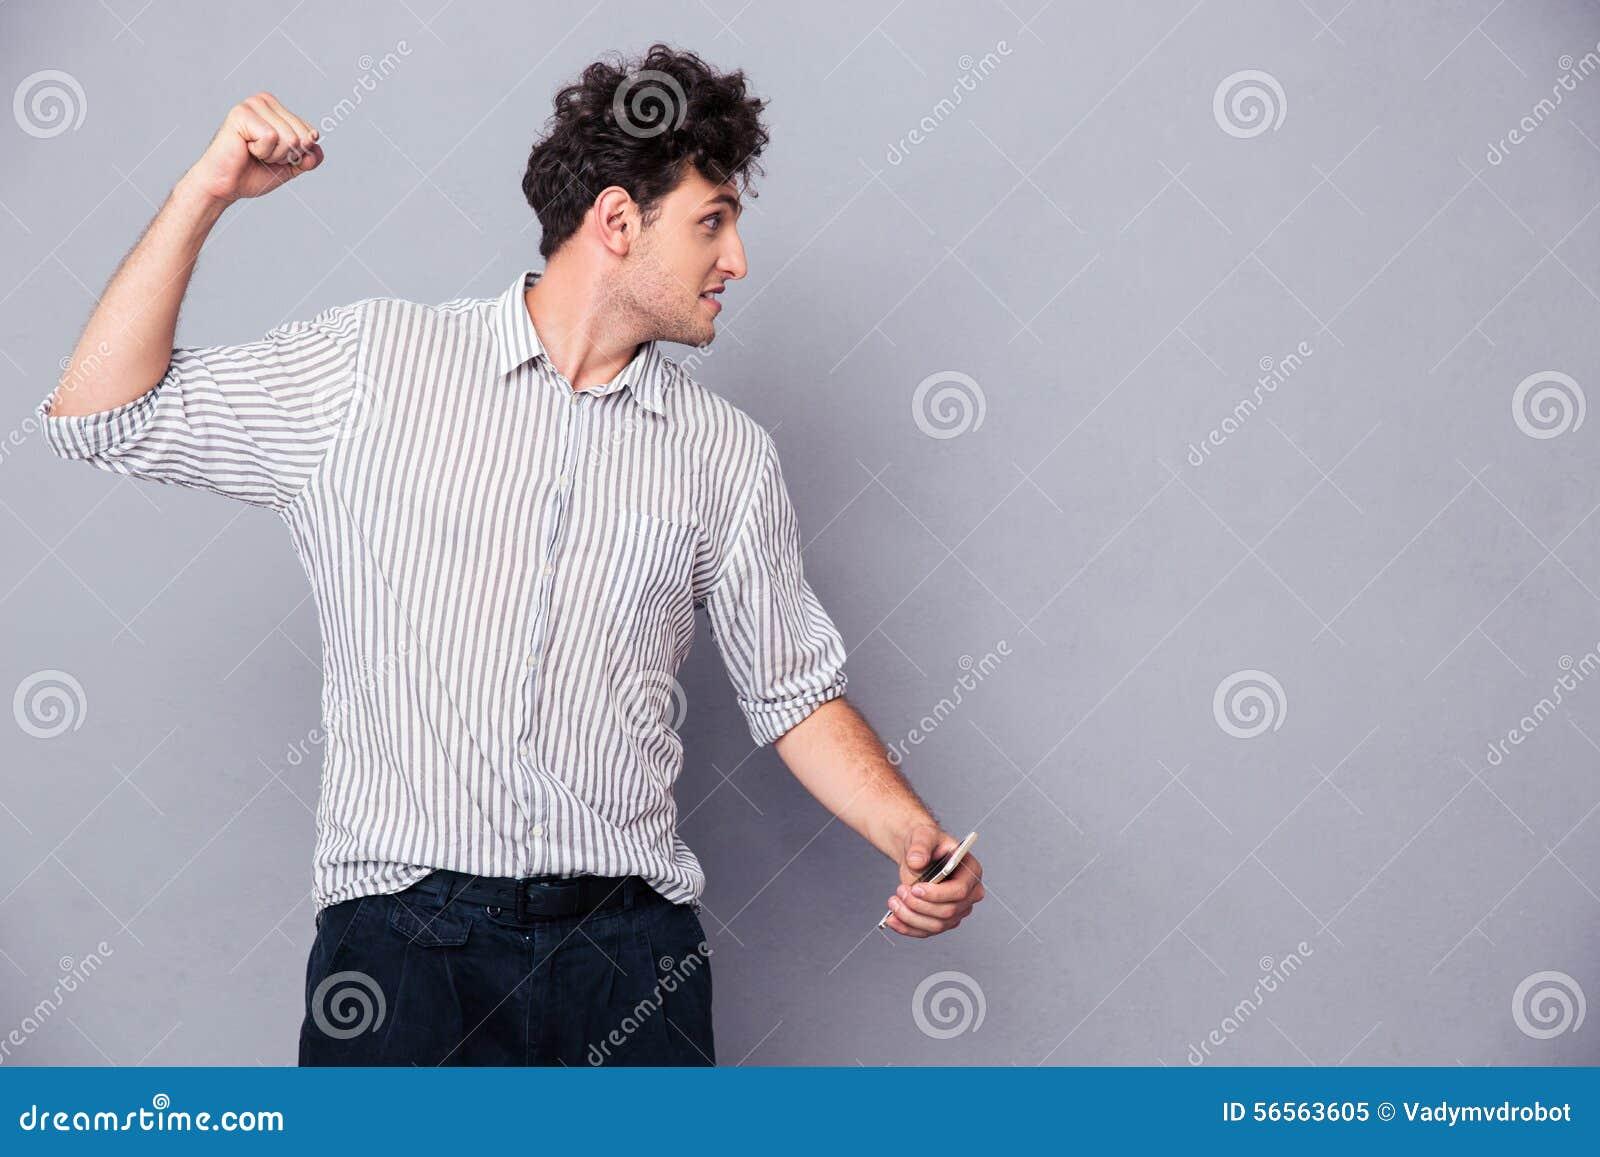 Download 0 νεαρός άνδρας που σφίγγει την πυγμή του Στοκ Εικόνα - εικόνα από πάλη, ένας: 56563605